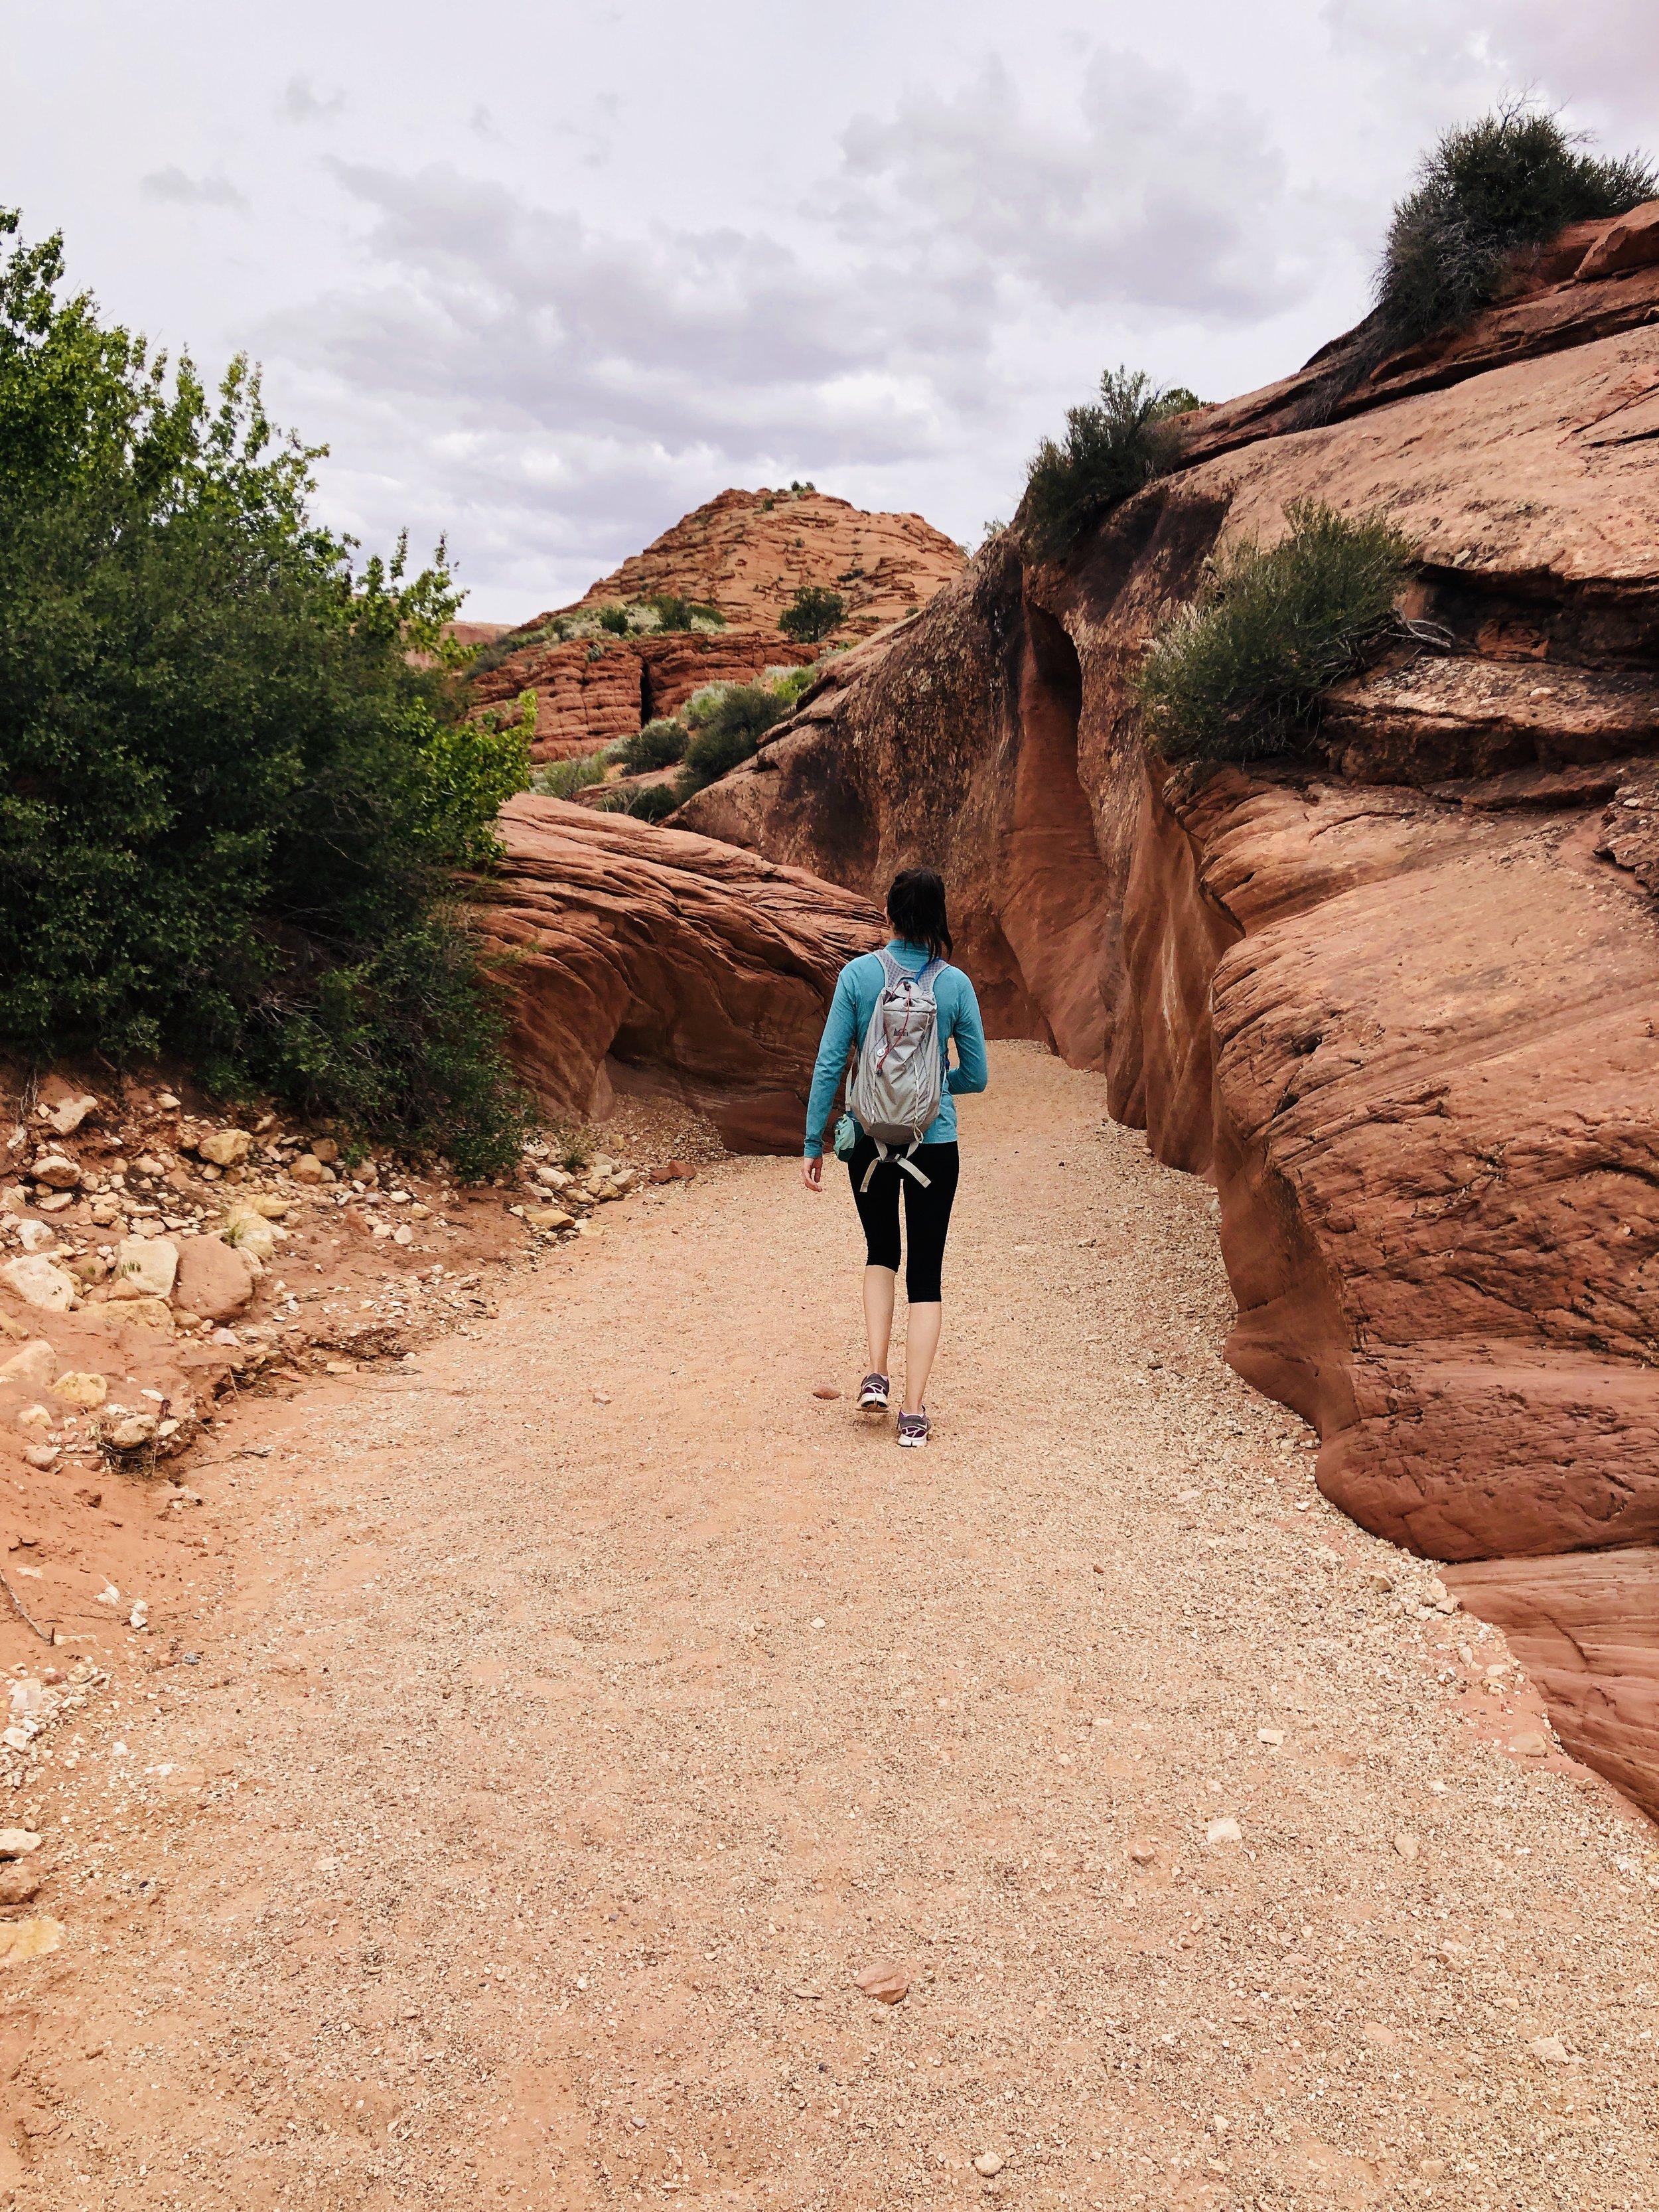 wire-pass-buckskin-gulch-utah-hiking-hike-out-office-adventure-travel